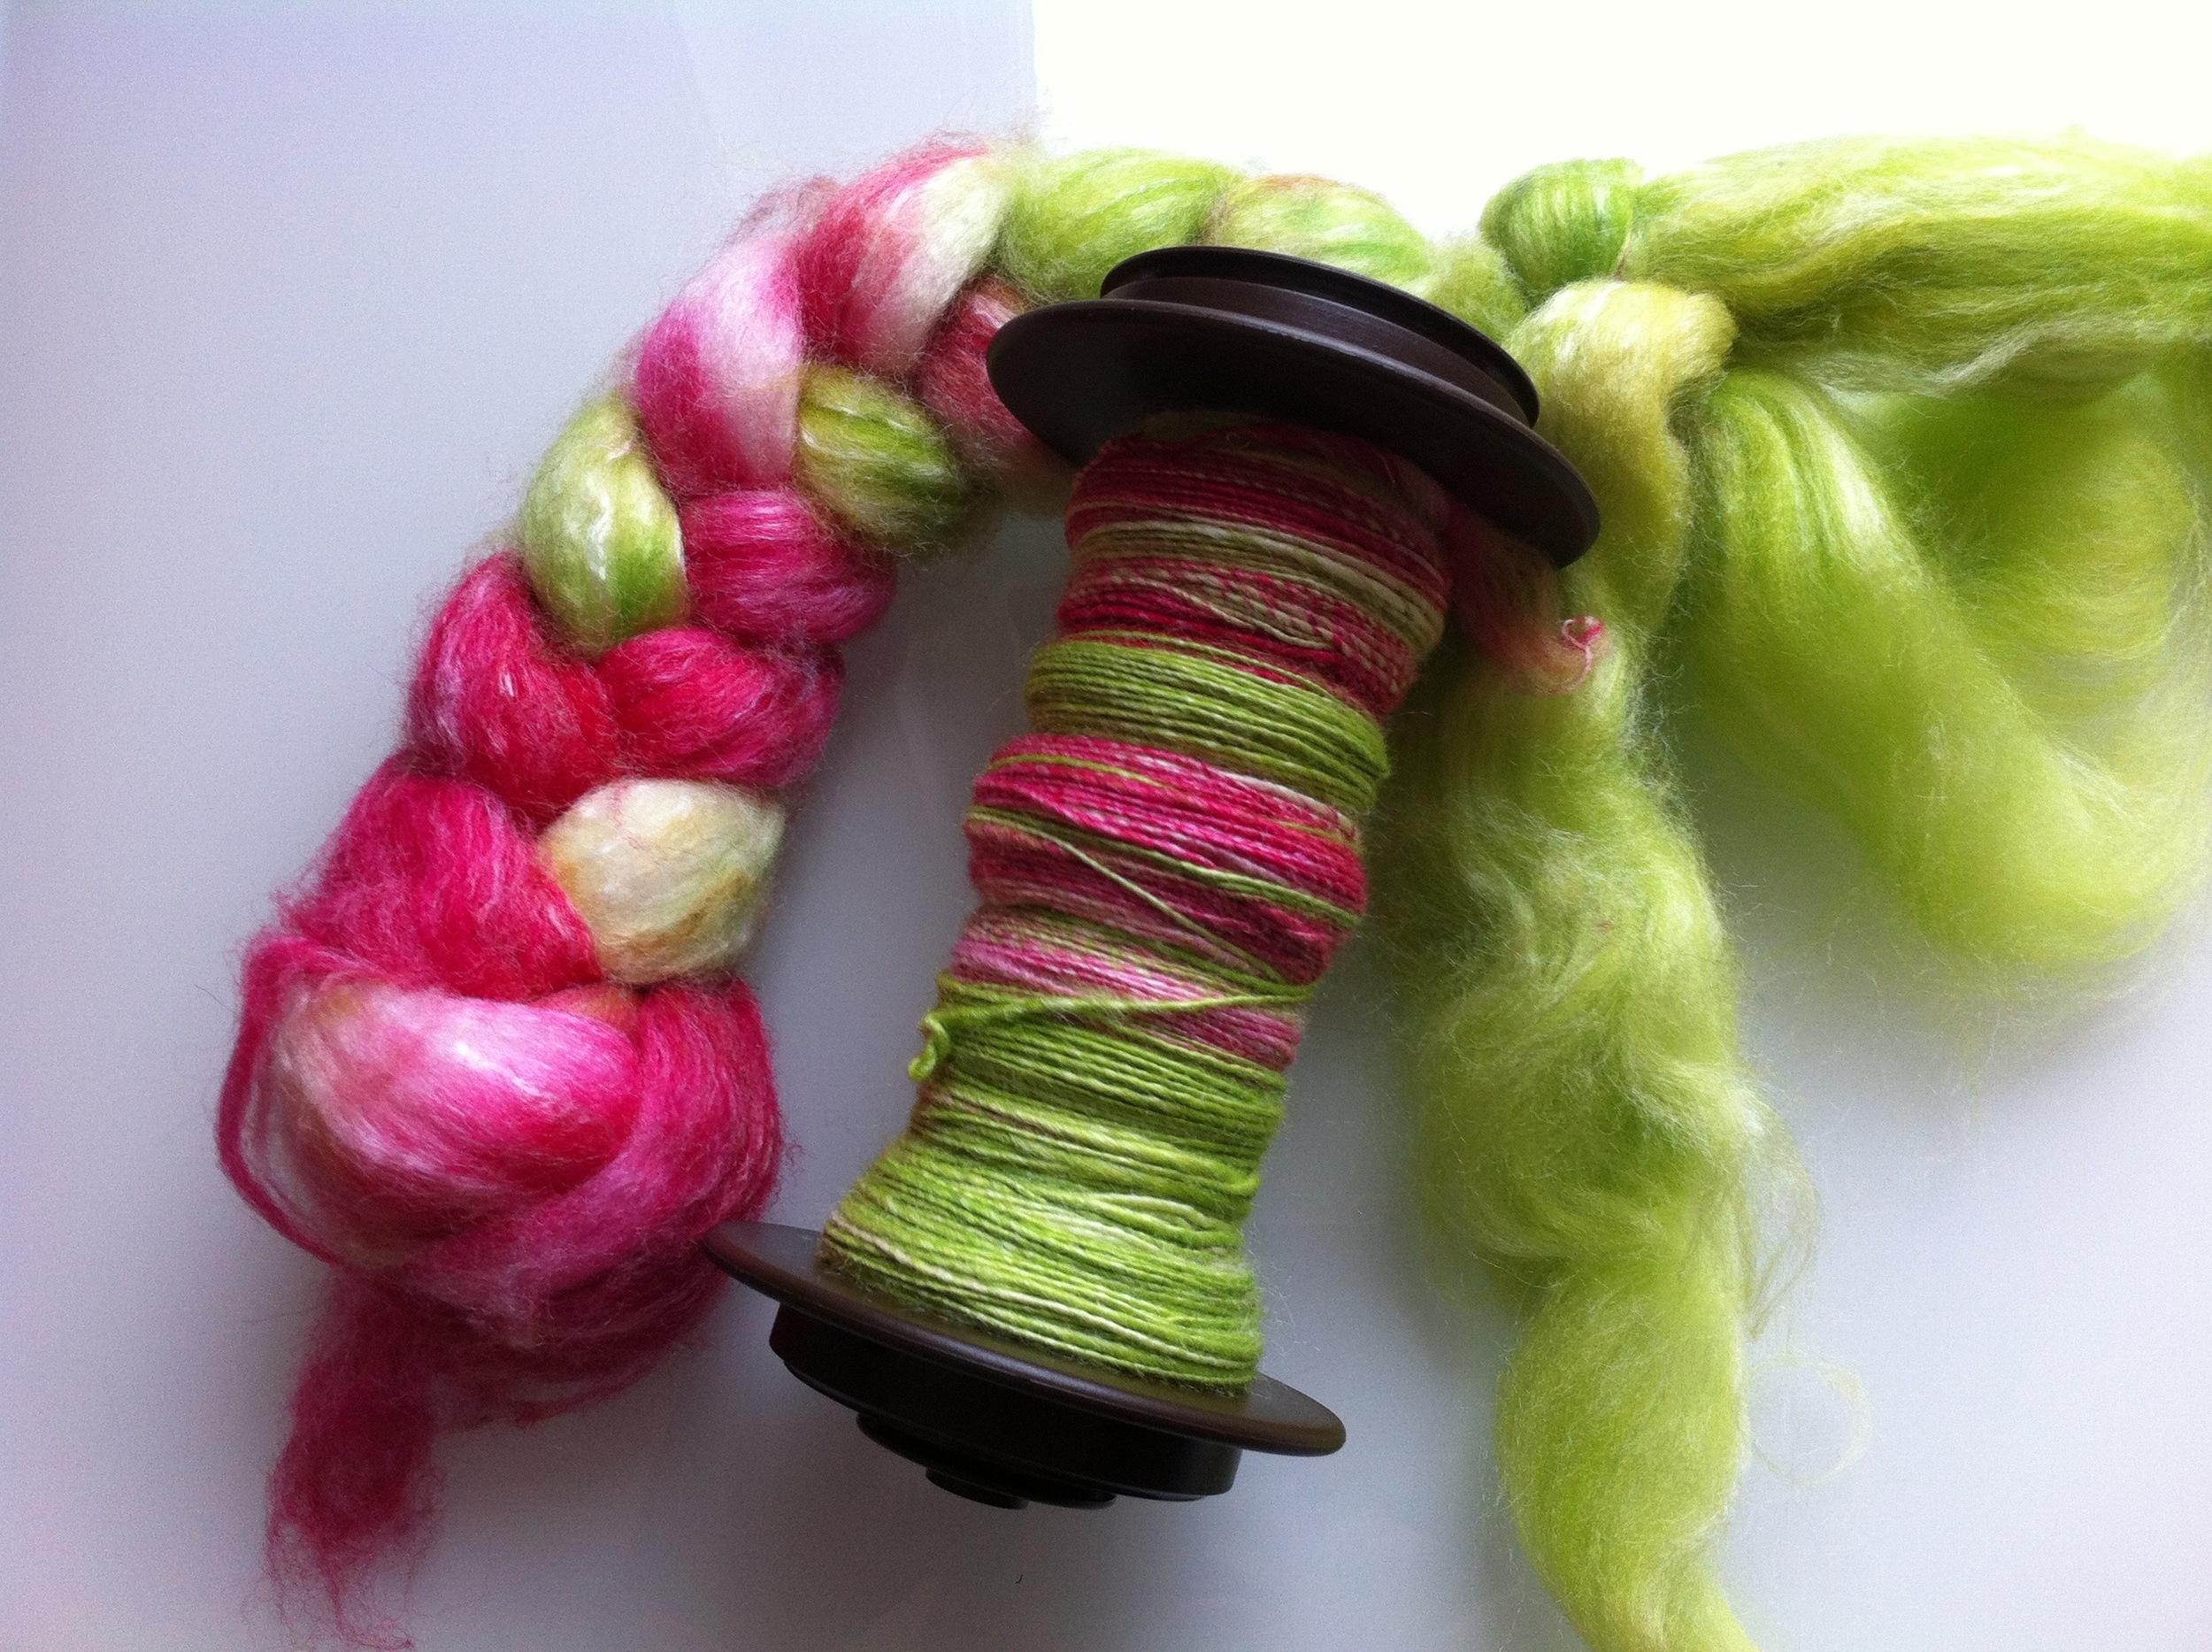 SweetGeorgia yarns Panda fibre in the Snapdragon colourway.